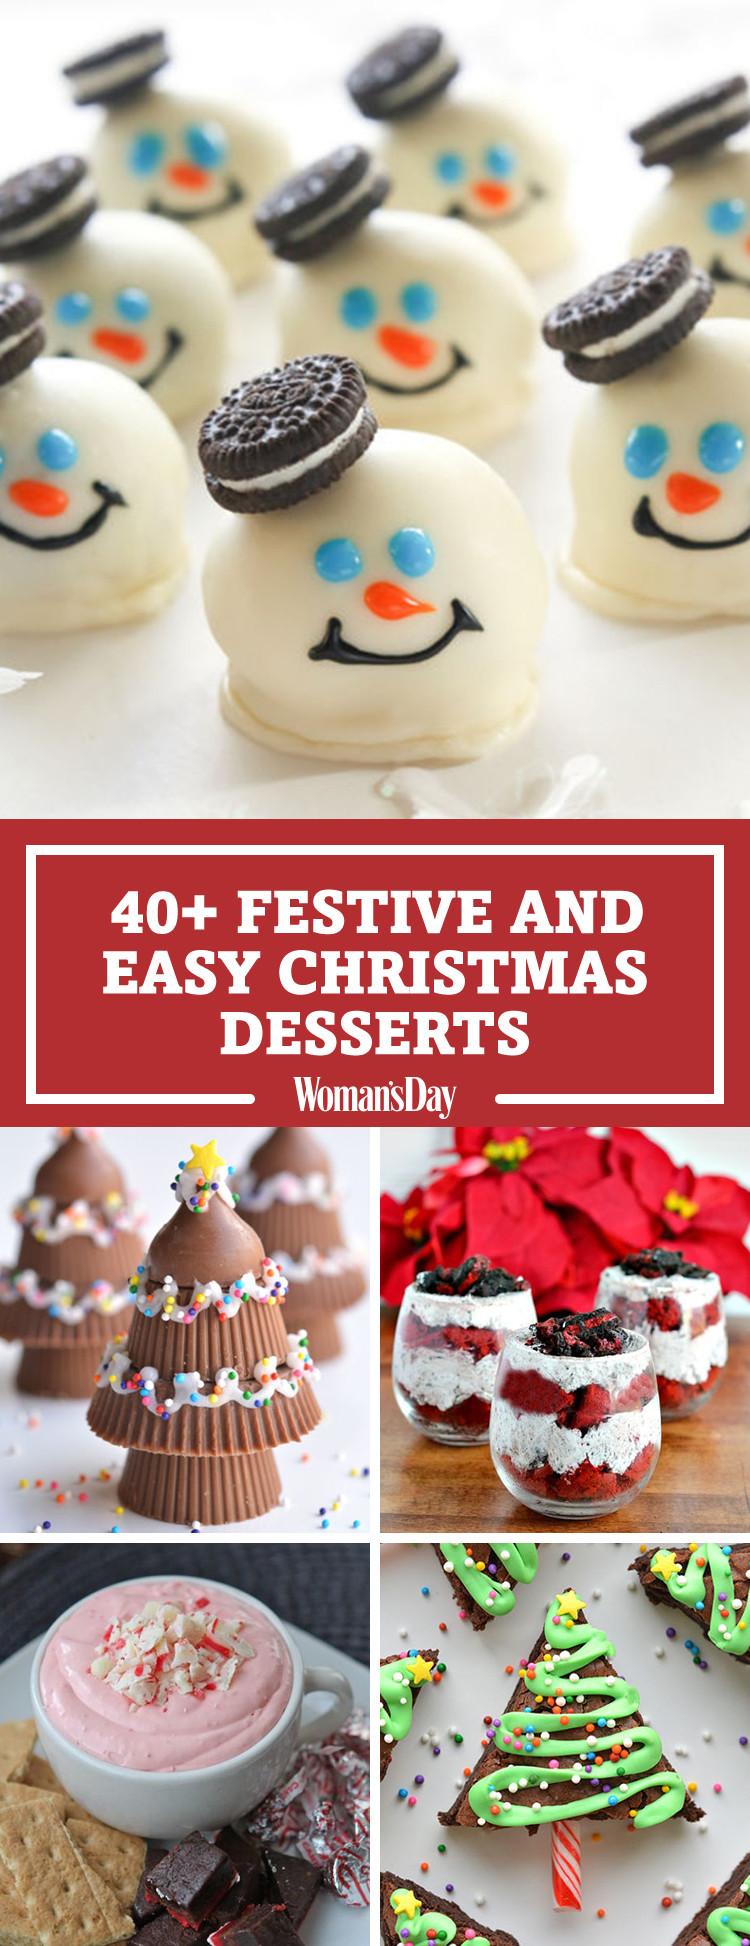 Simple Christmas Desserts Recipe  57 Easy Christmas Dessert Recipes Best Ideas for Fun